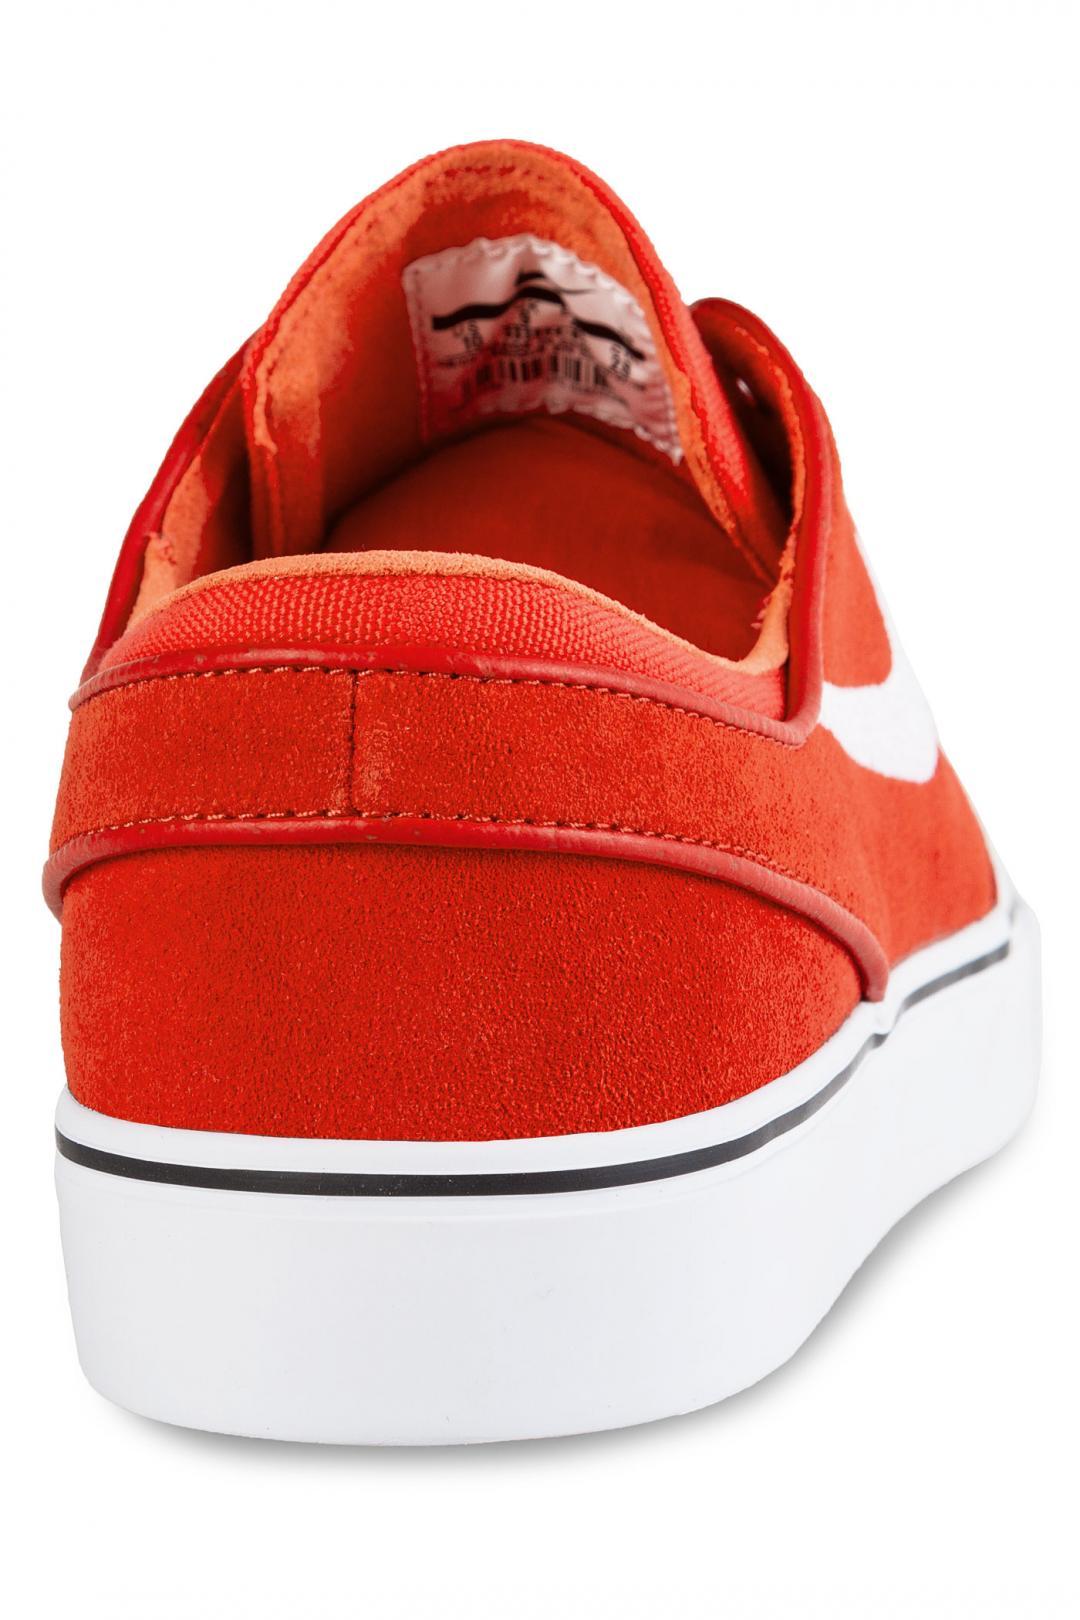 Uomo/Donna Nike SB Zoom Stefan Janoski max orange white black | Sneakers low top